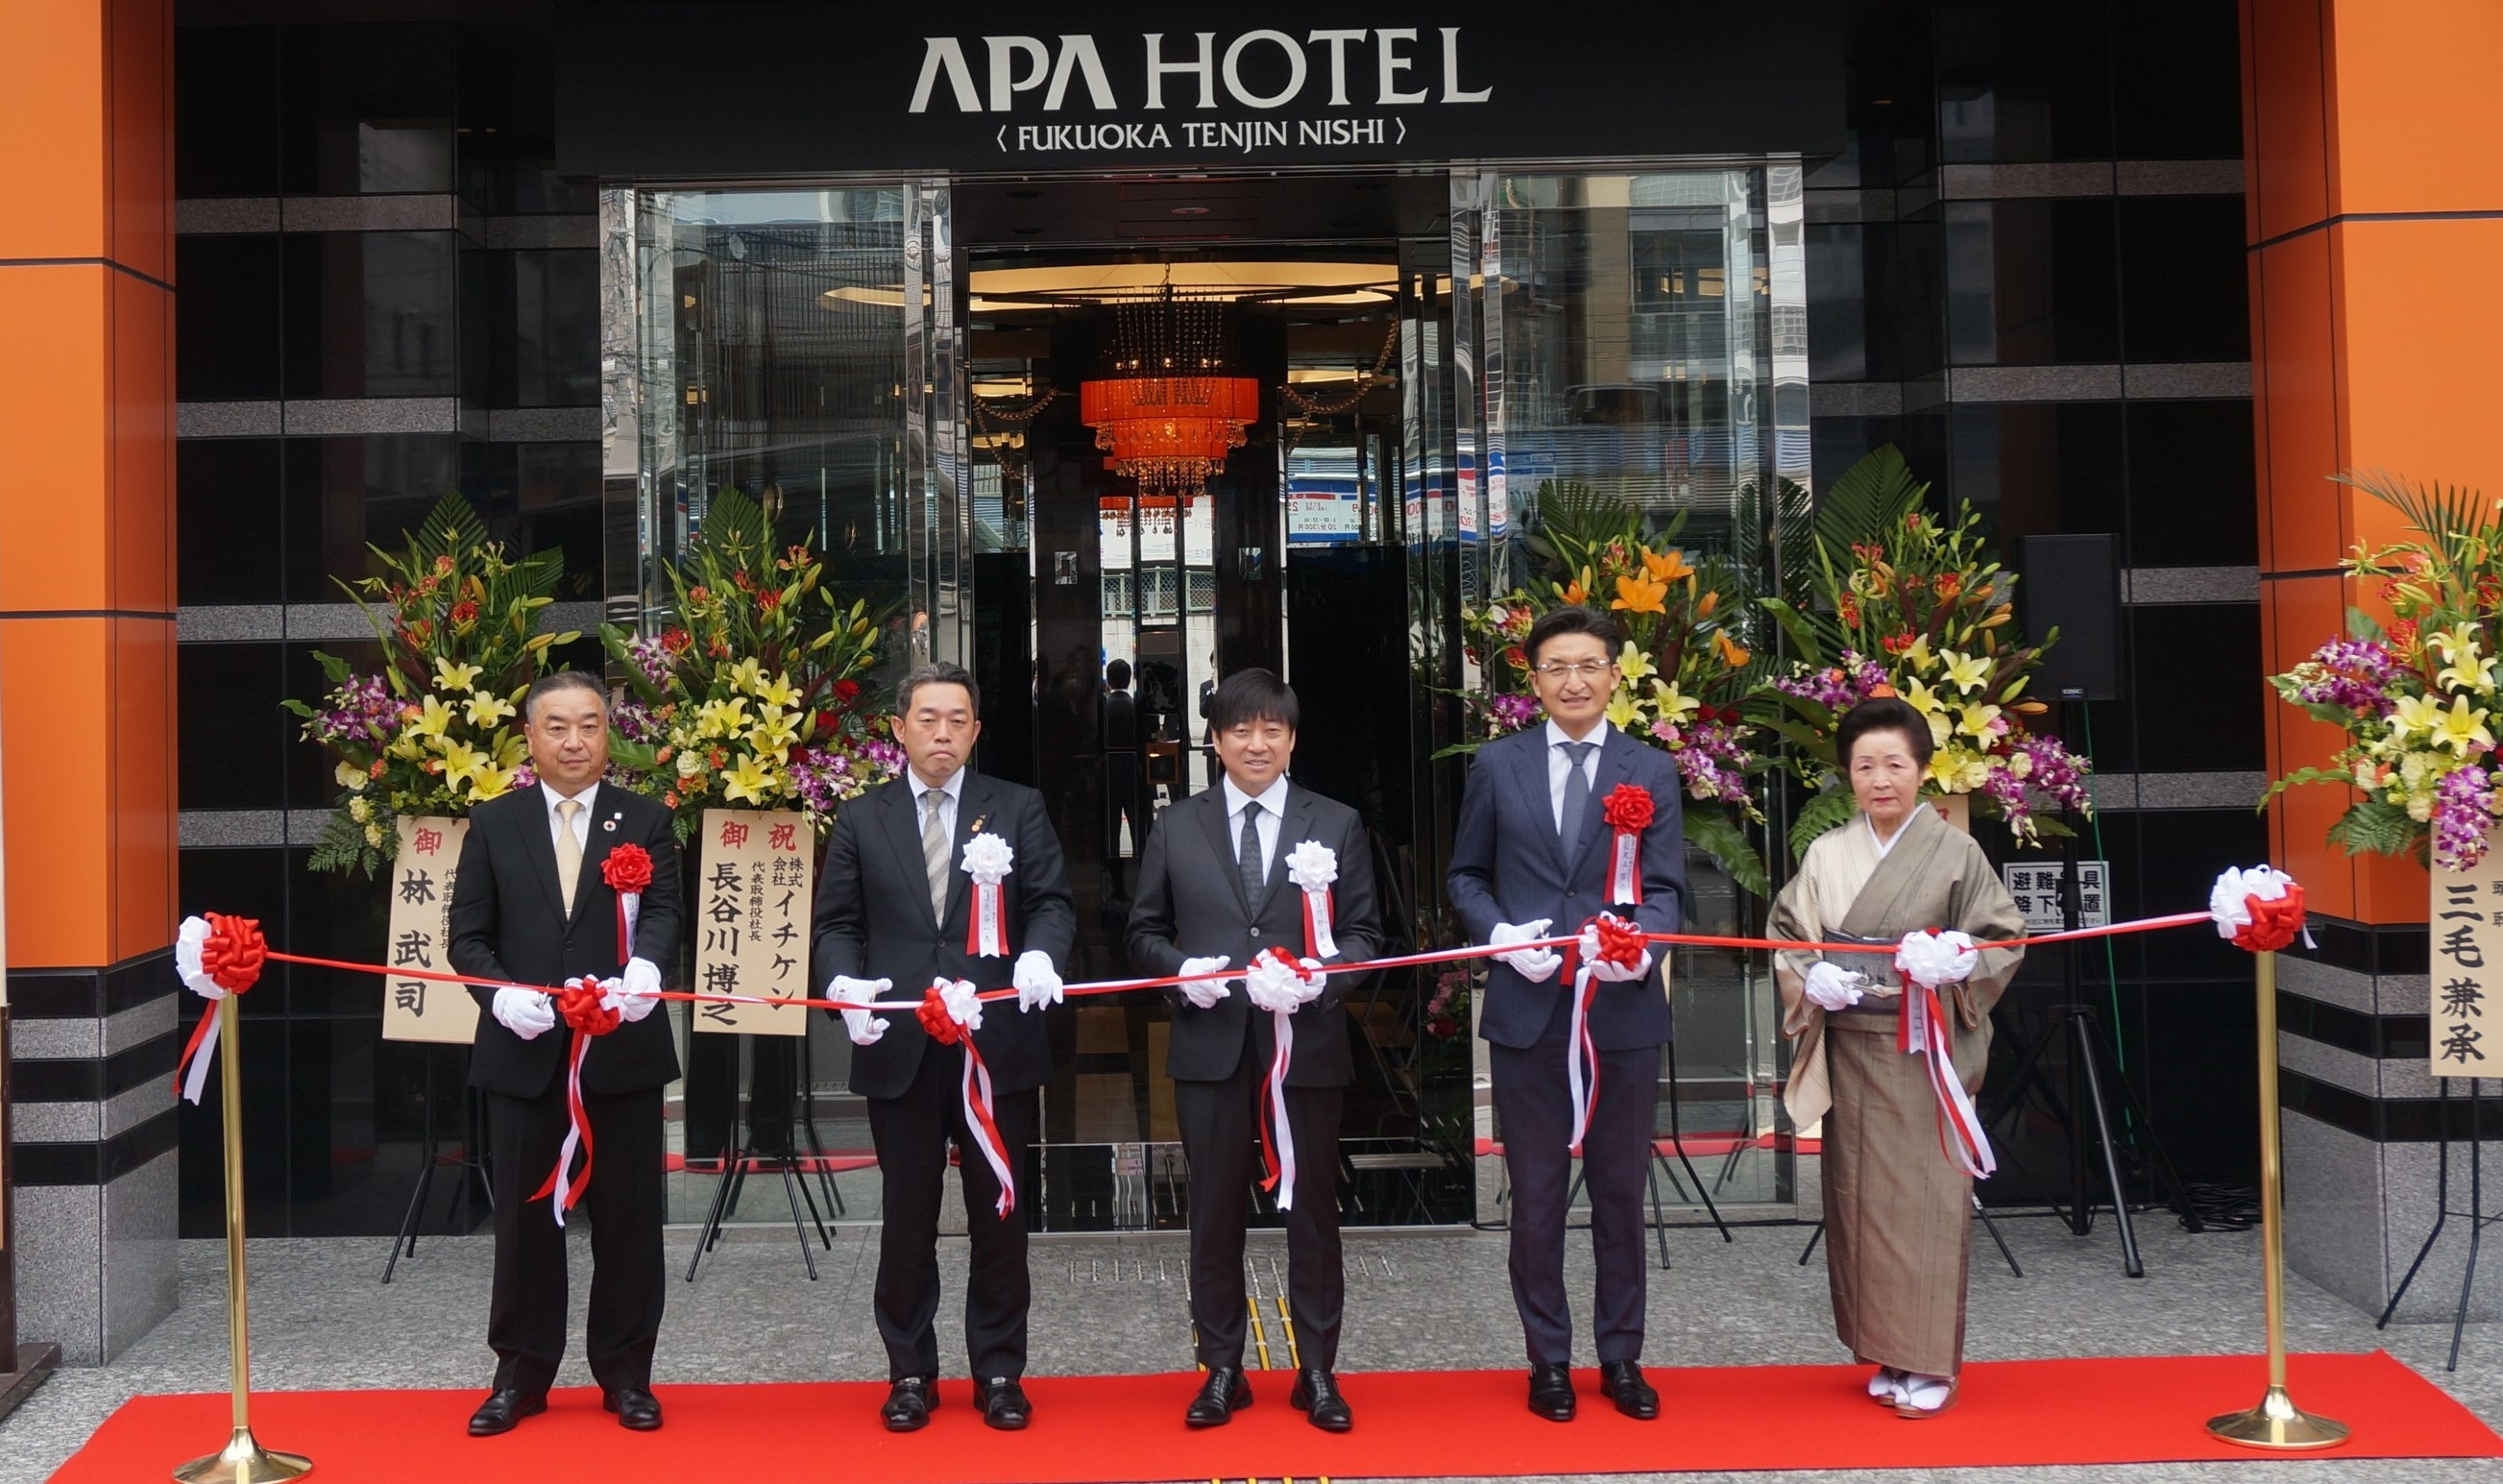 TKP、福岡・天神エリアに九州2棟目のホテルを建設し、本日開業! 「アパホテル〈福岡天神西〉」~2020年5月25日 開業記者発表~